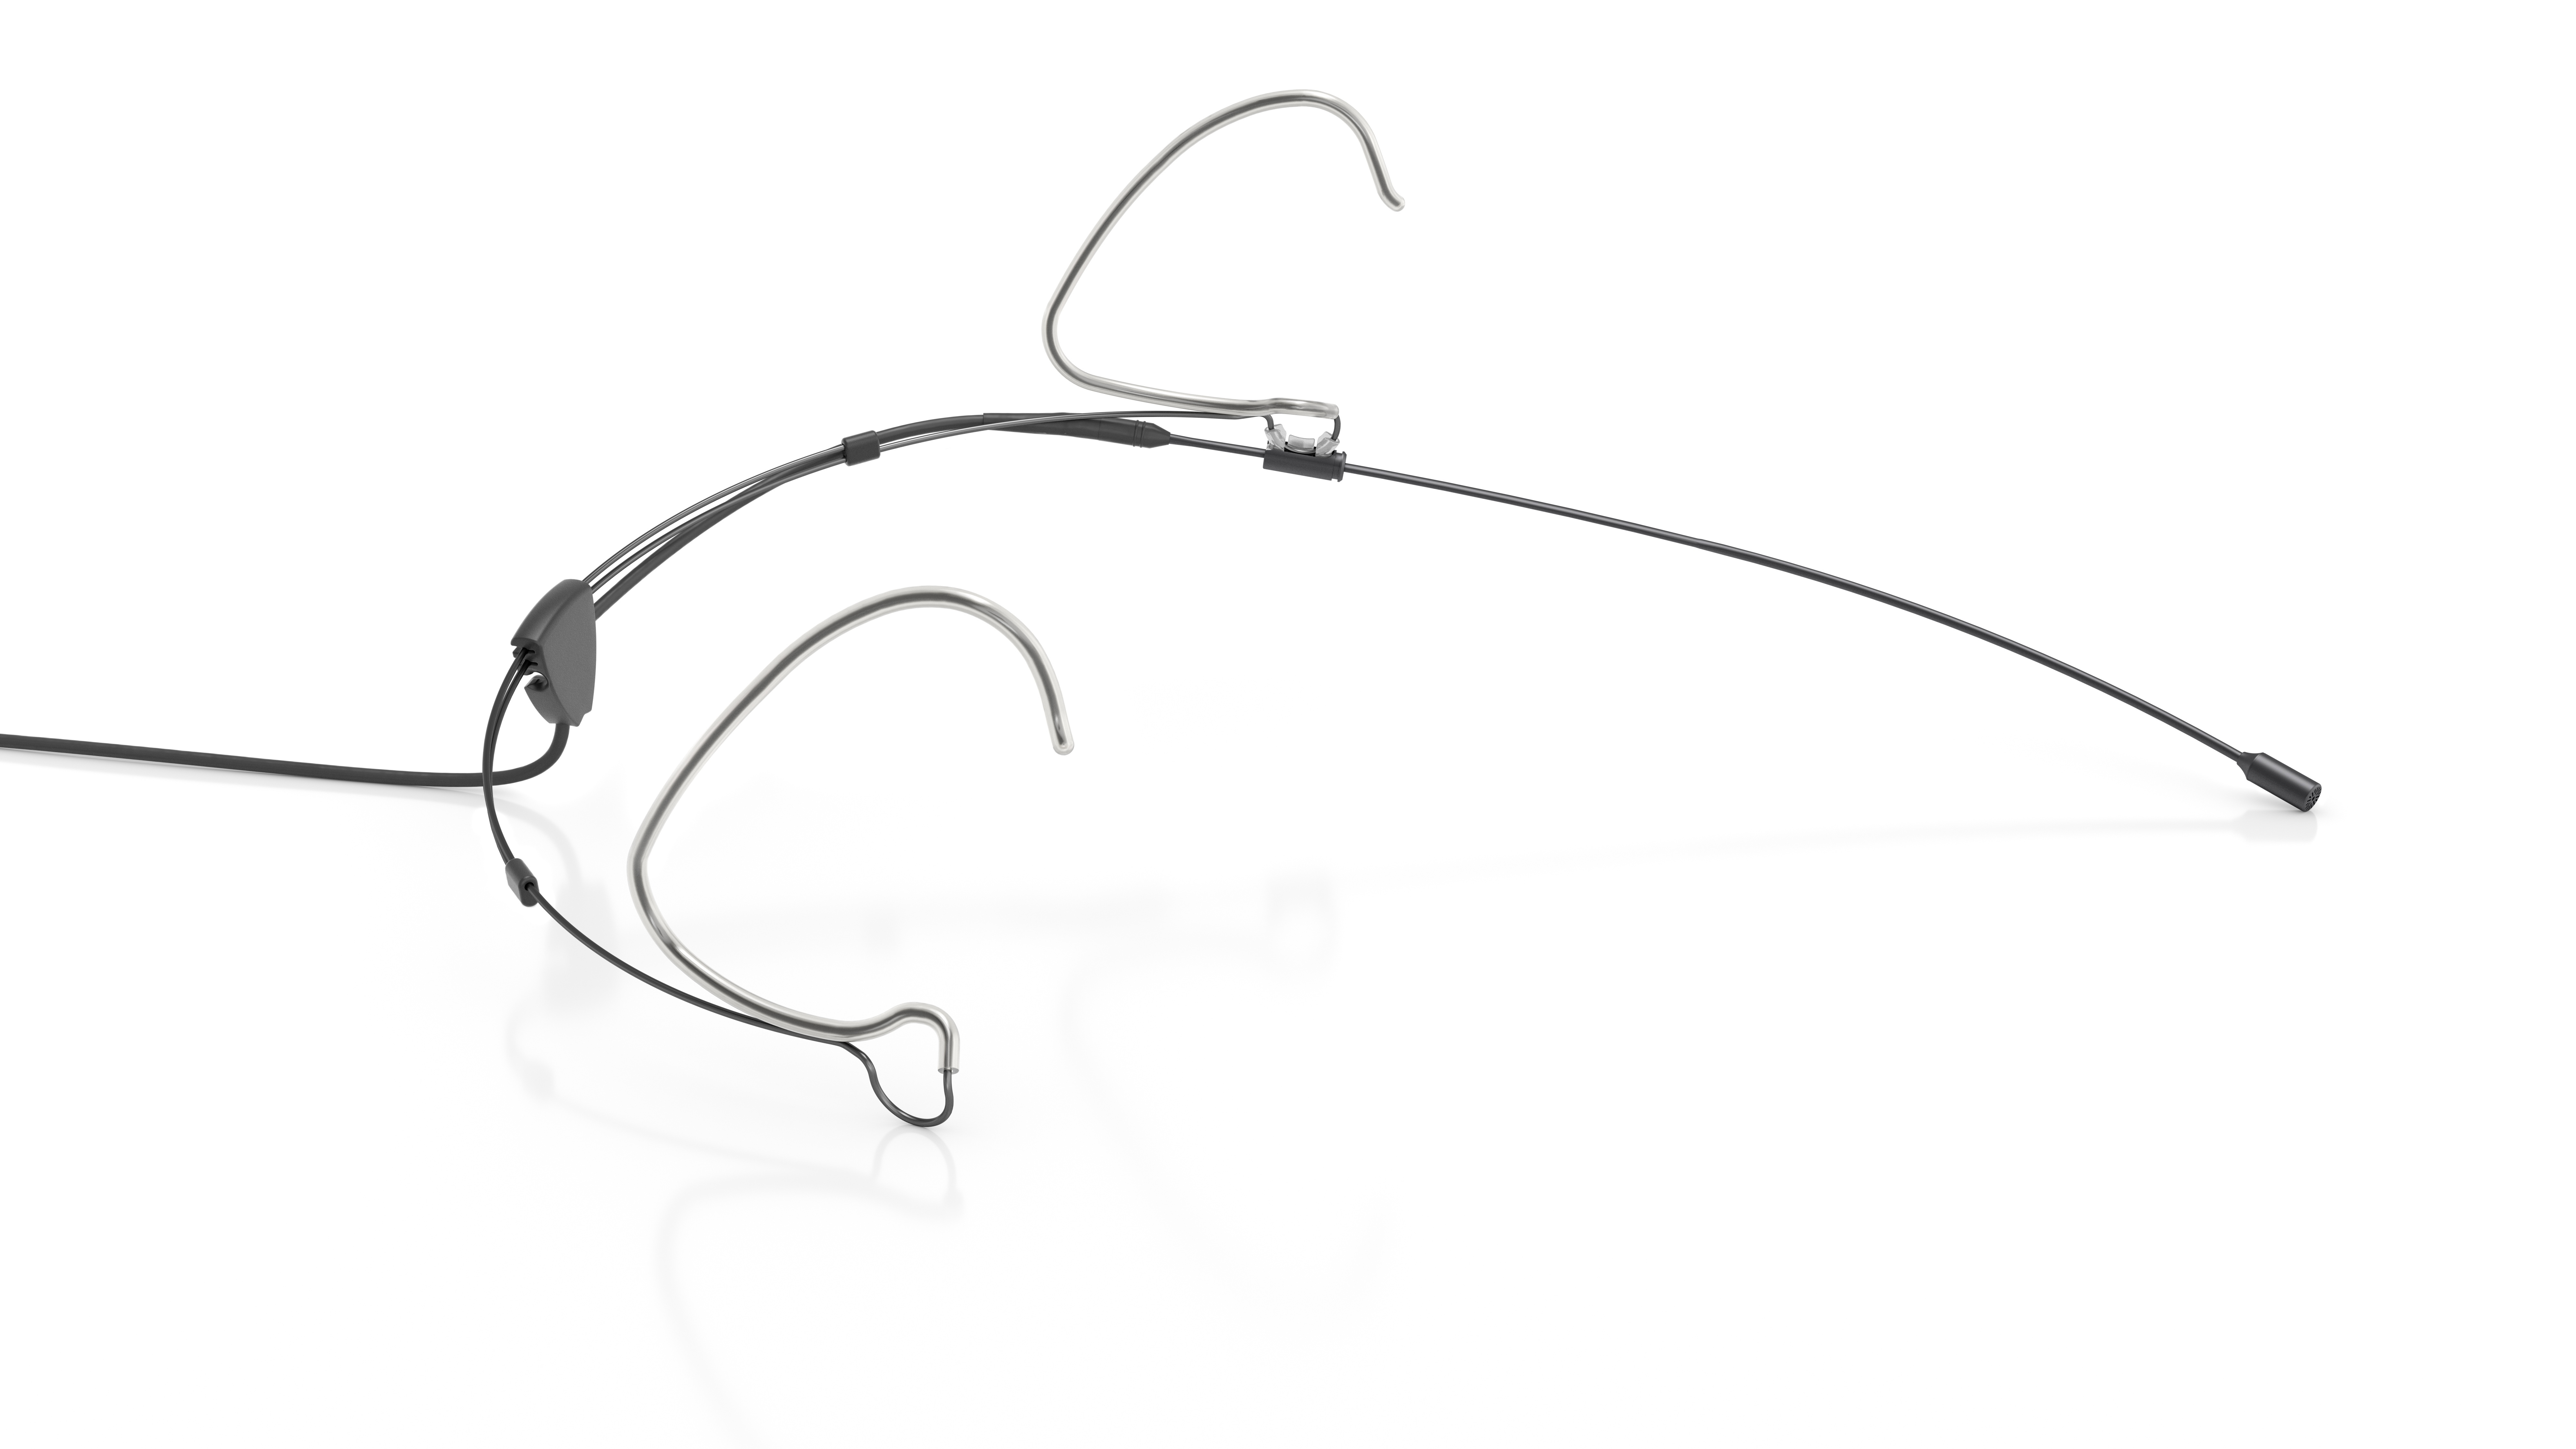 6066-headset-subminiature-Black.jpg